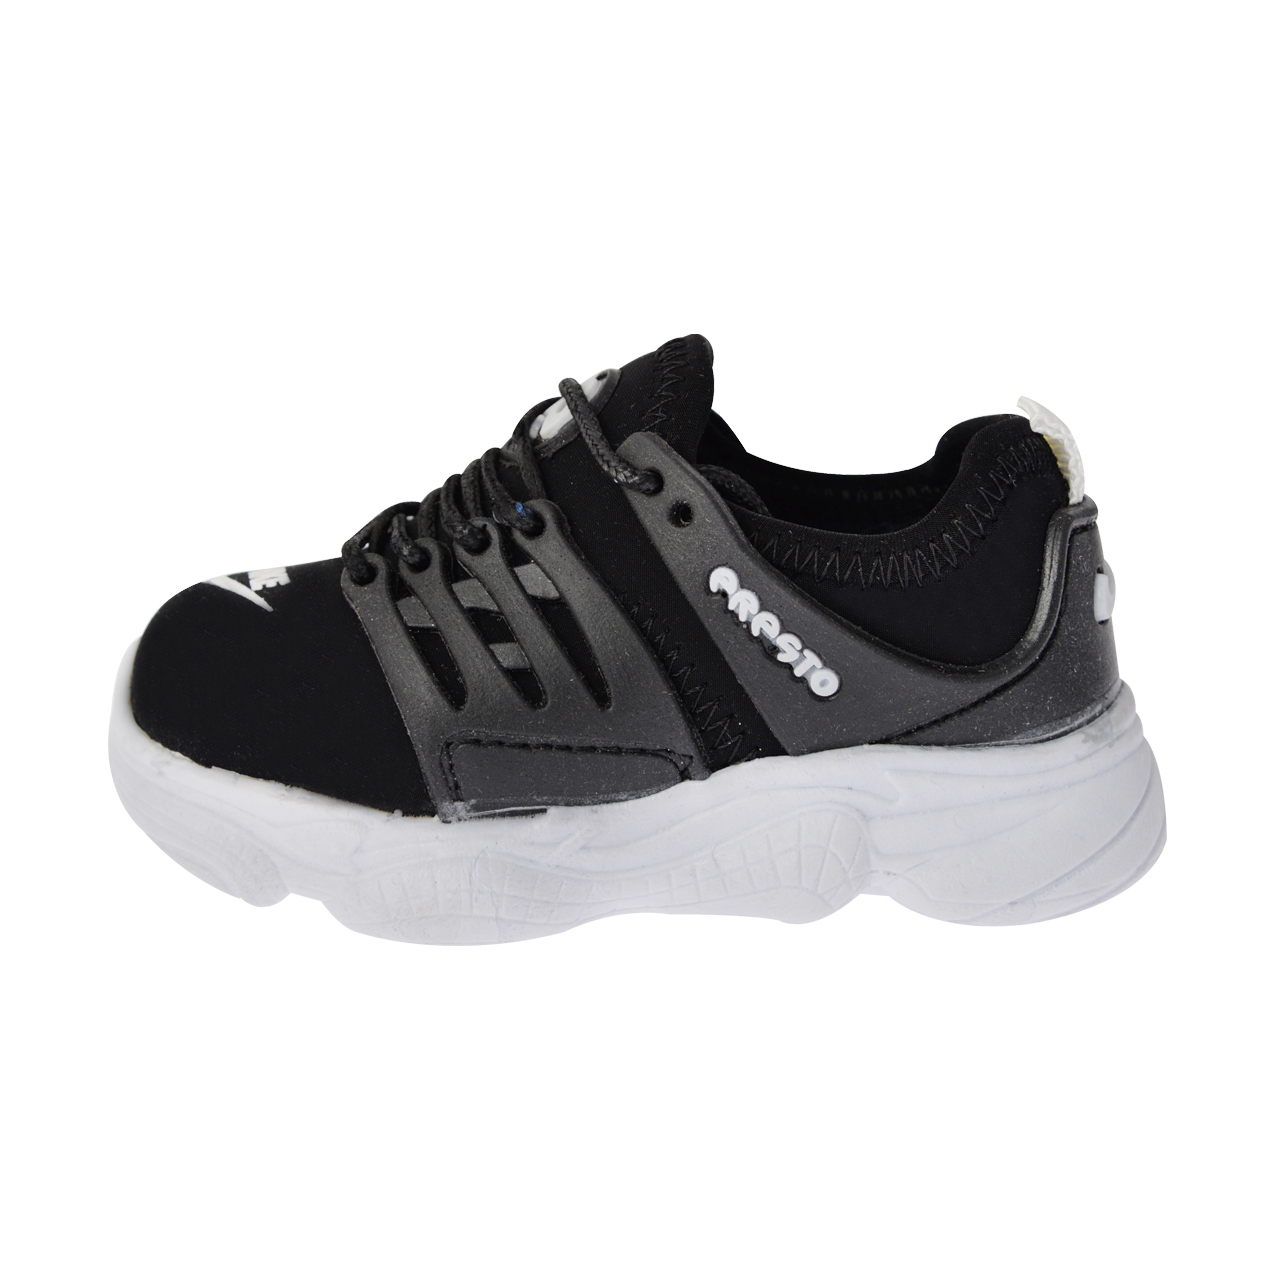 کفش مخصوص دویدن کد 349001402                     غیر اصل